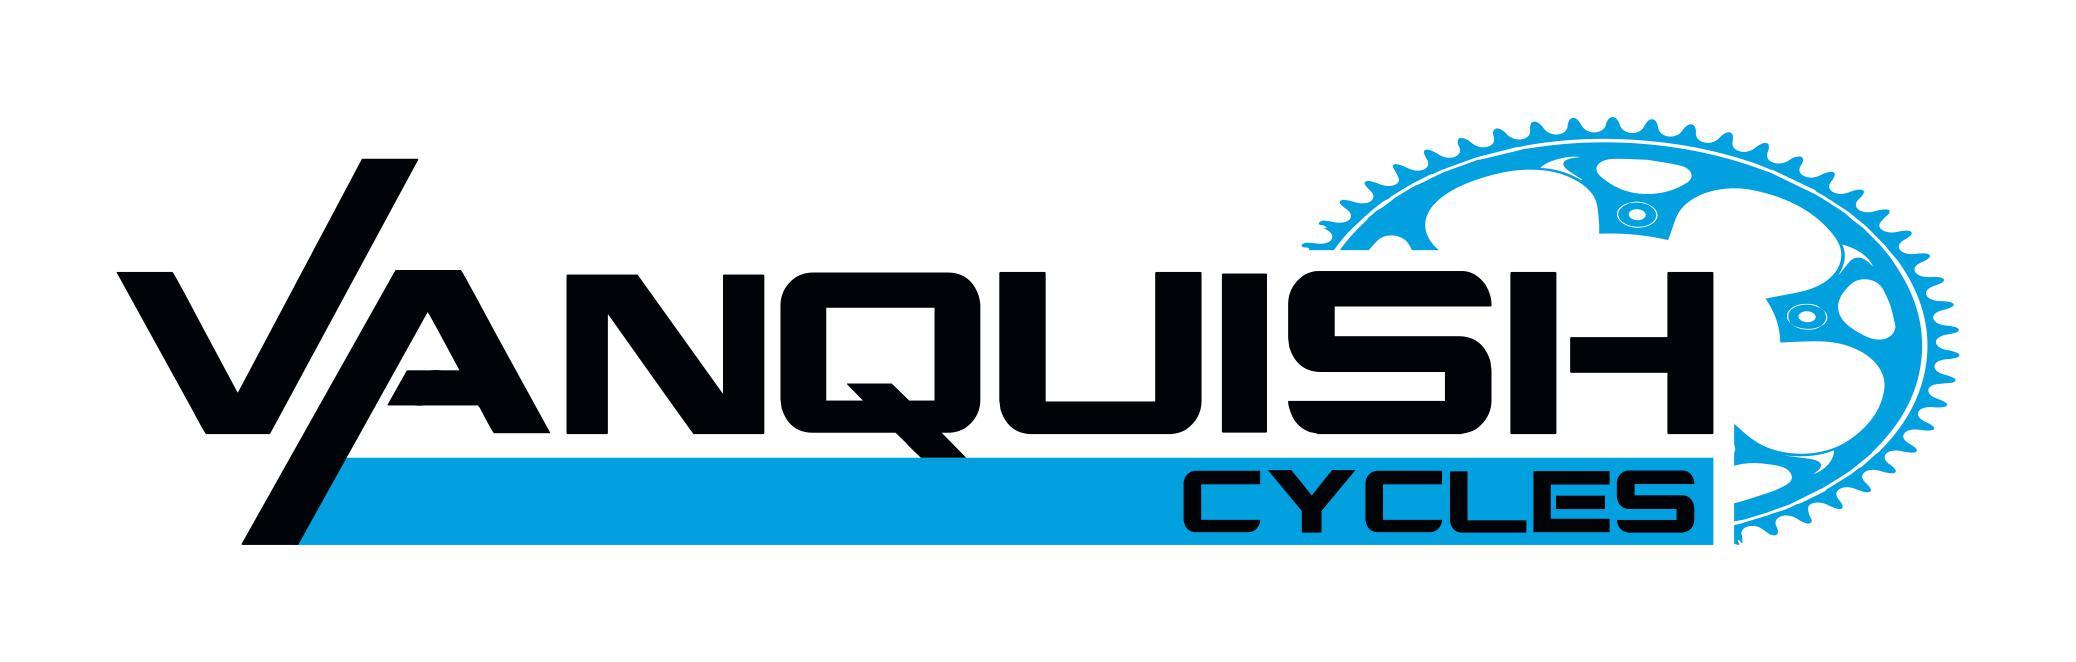 Vanquish Cycles